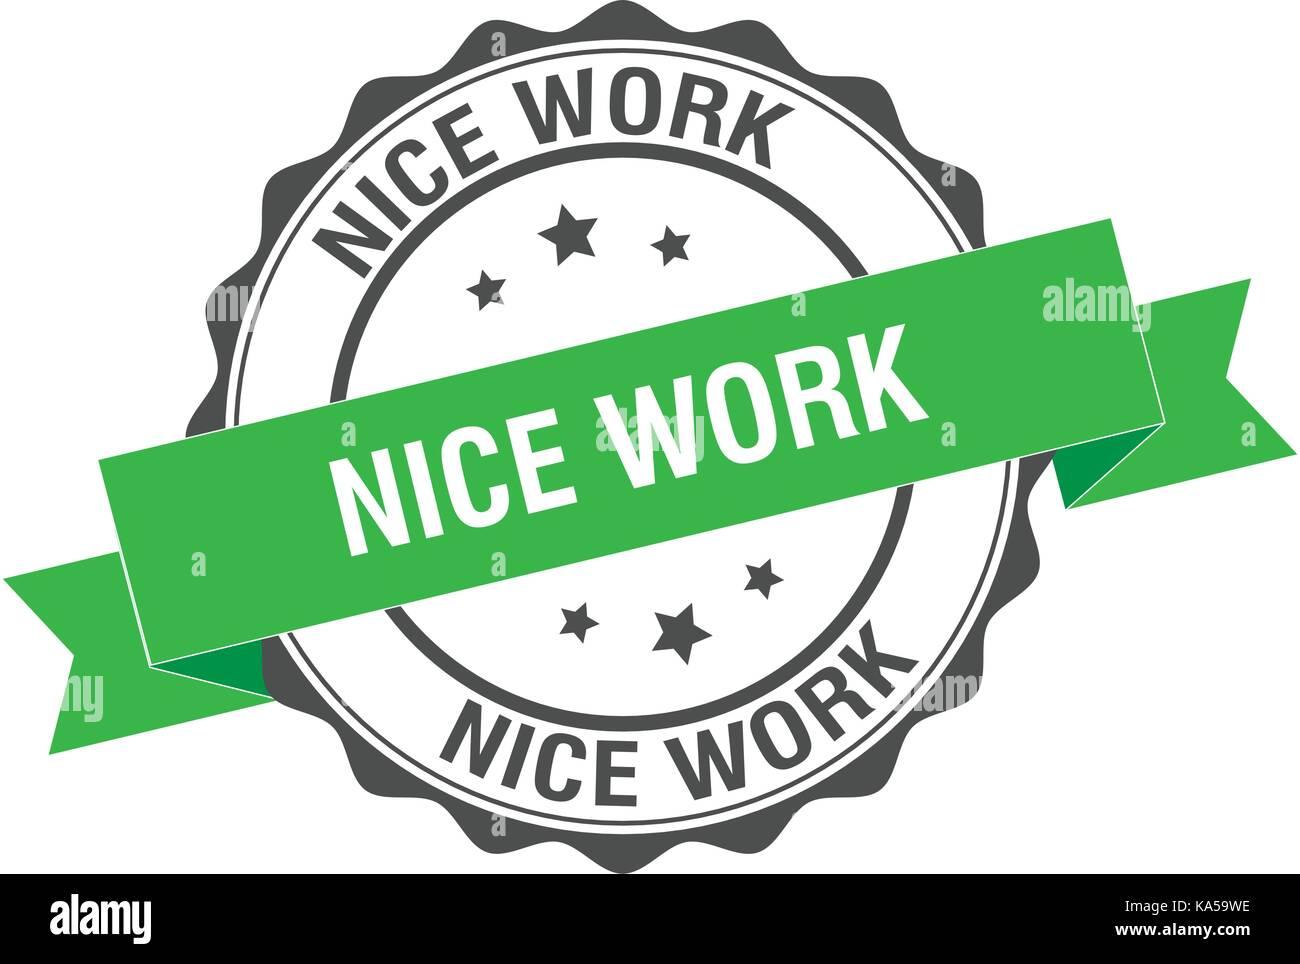 Nice Work Stamp Illustration Stock Vector Image Art Alamy